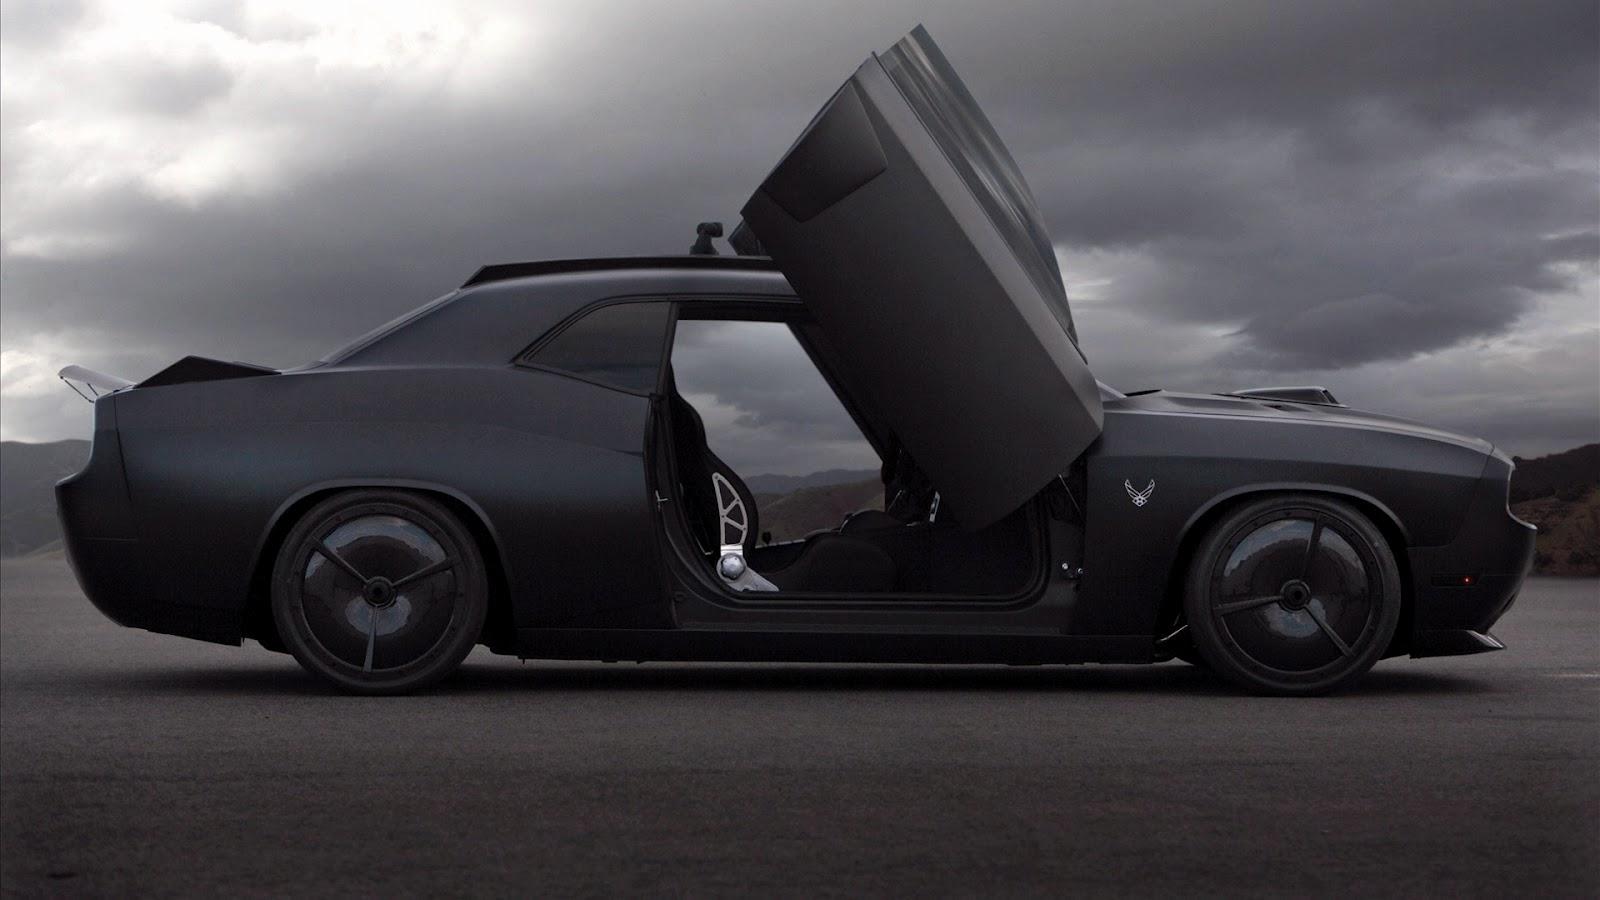 Driver San Francisco Challenger free desktop backgrounds  - driver san francisco challenger wallpapers